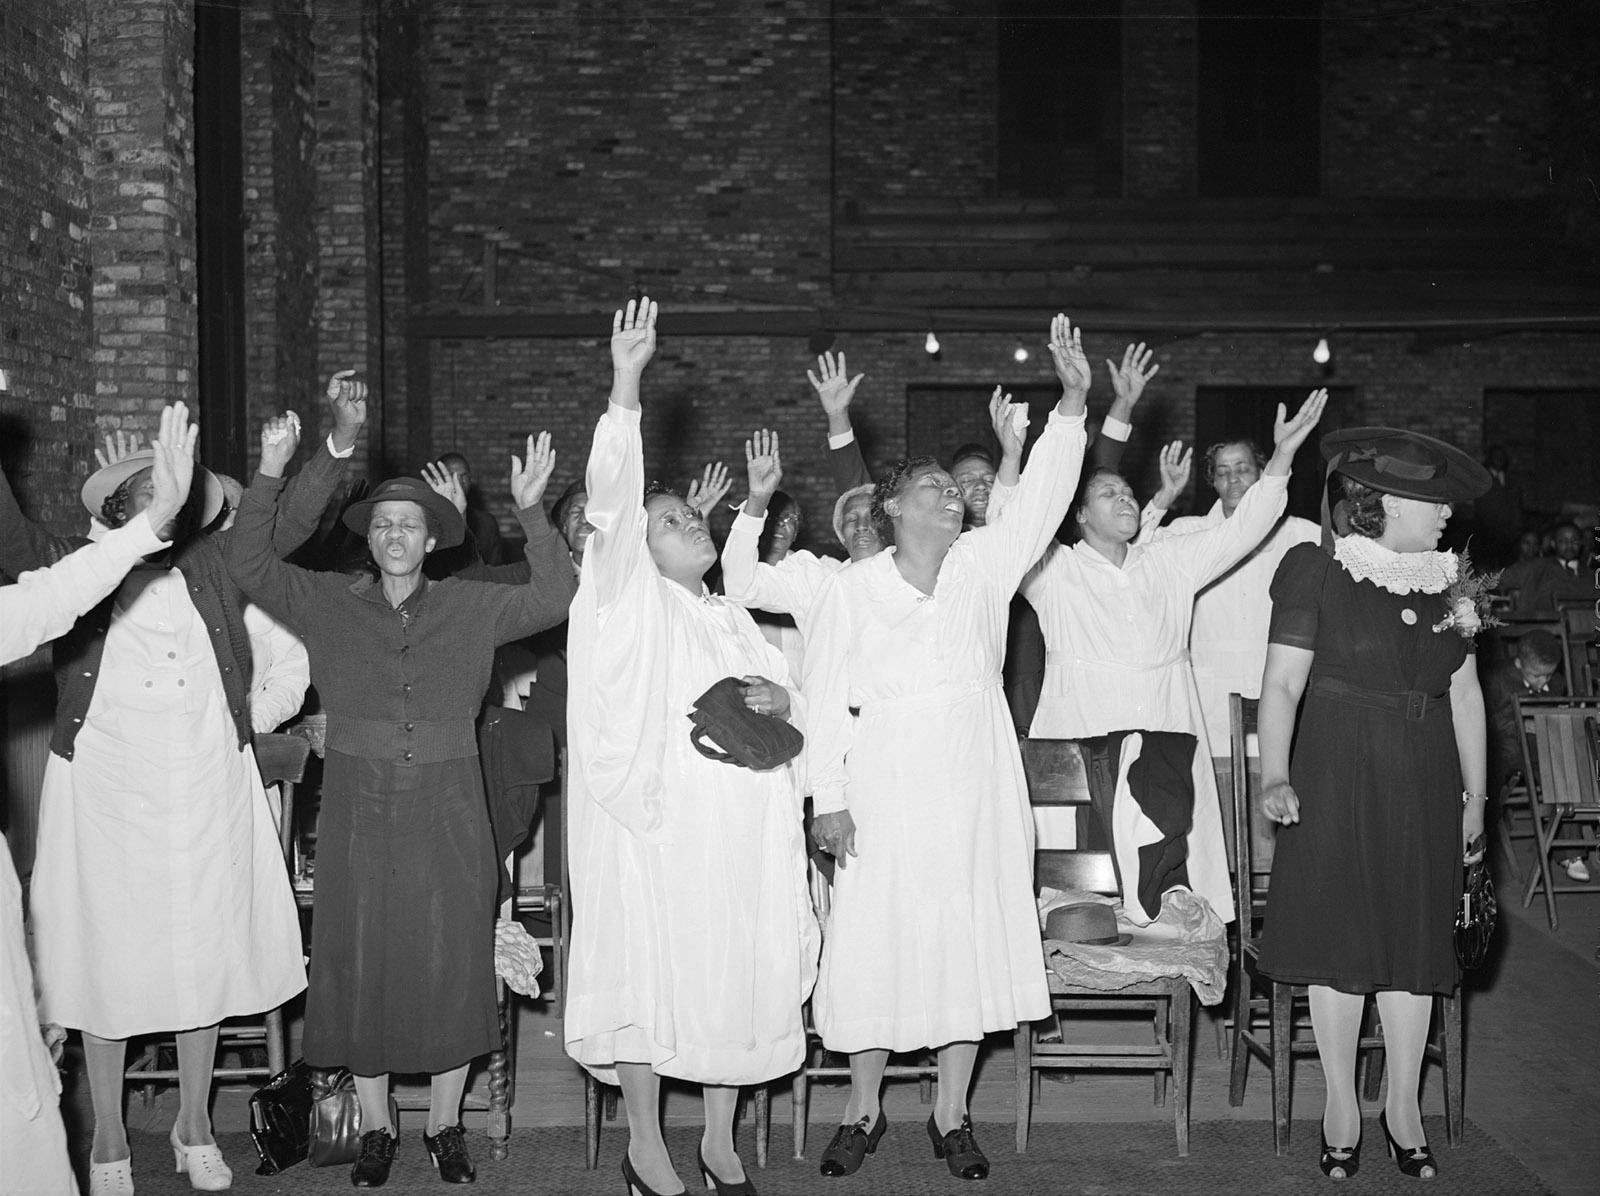 Worshipers at a Pentecostal church